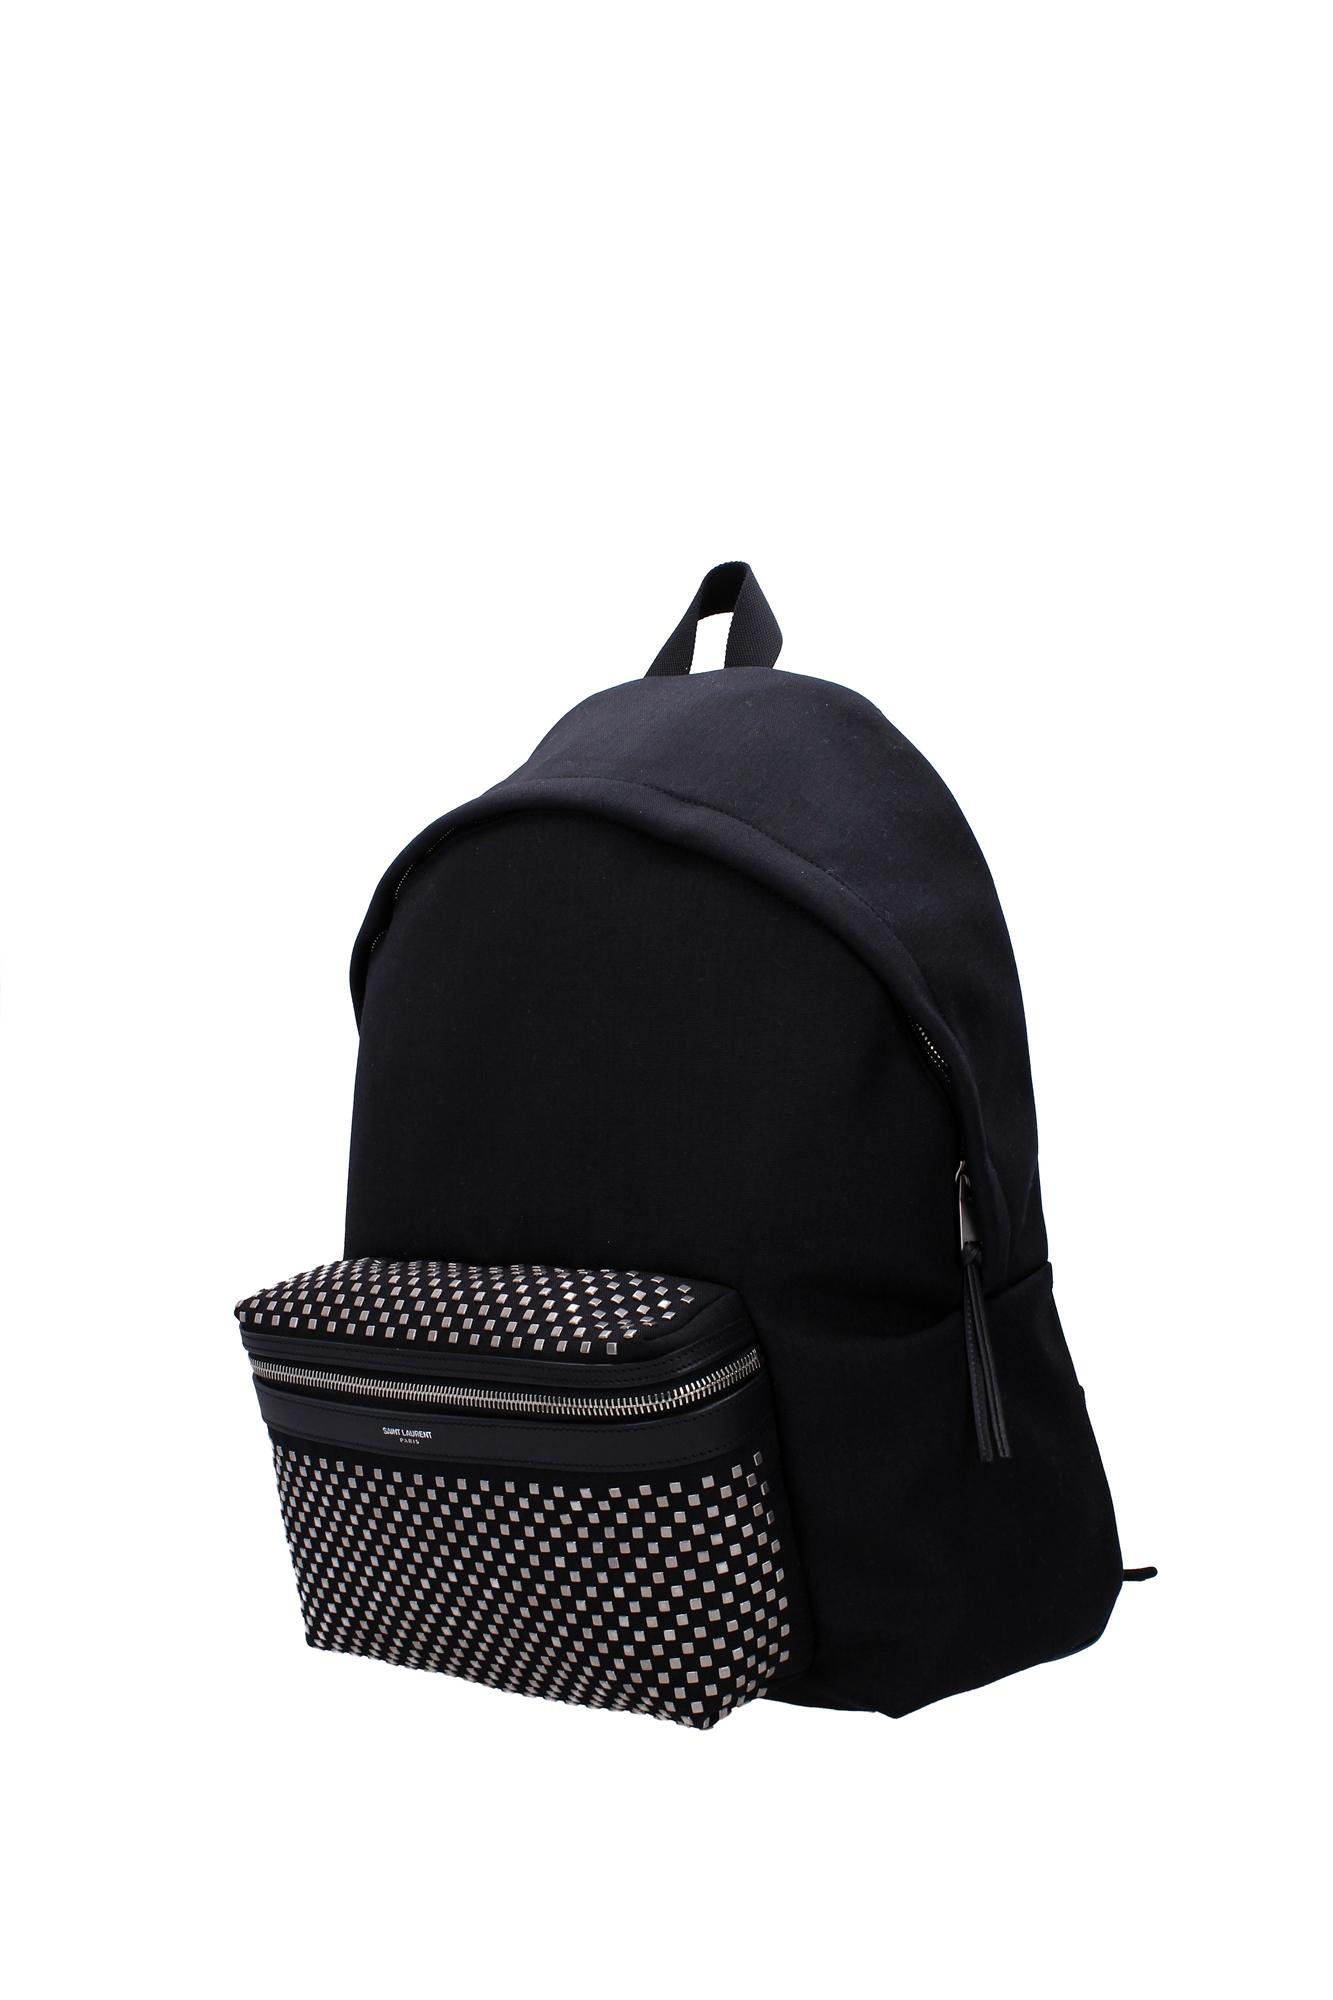 tasche rucksack saint laurent herren stoff schwarz. Black Bedroom Furniture Sets. Home Design Ideas